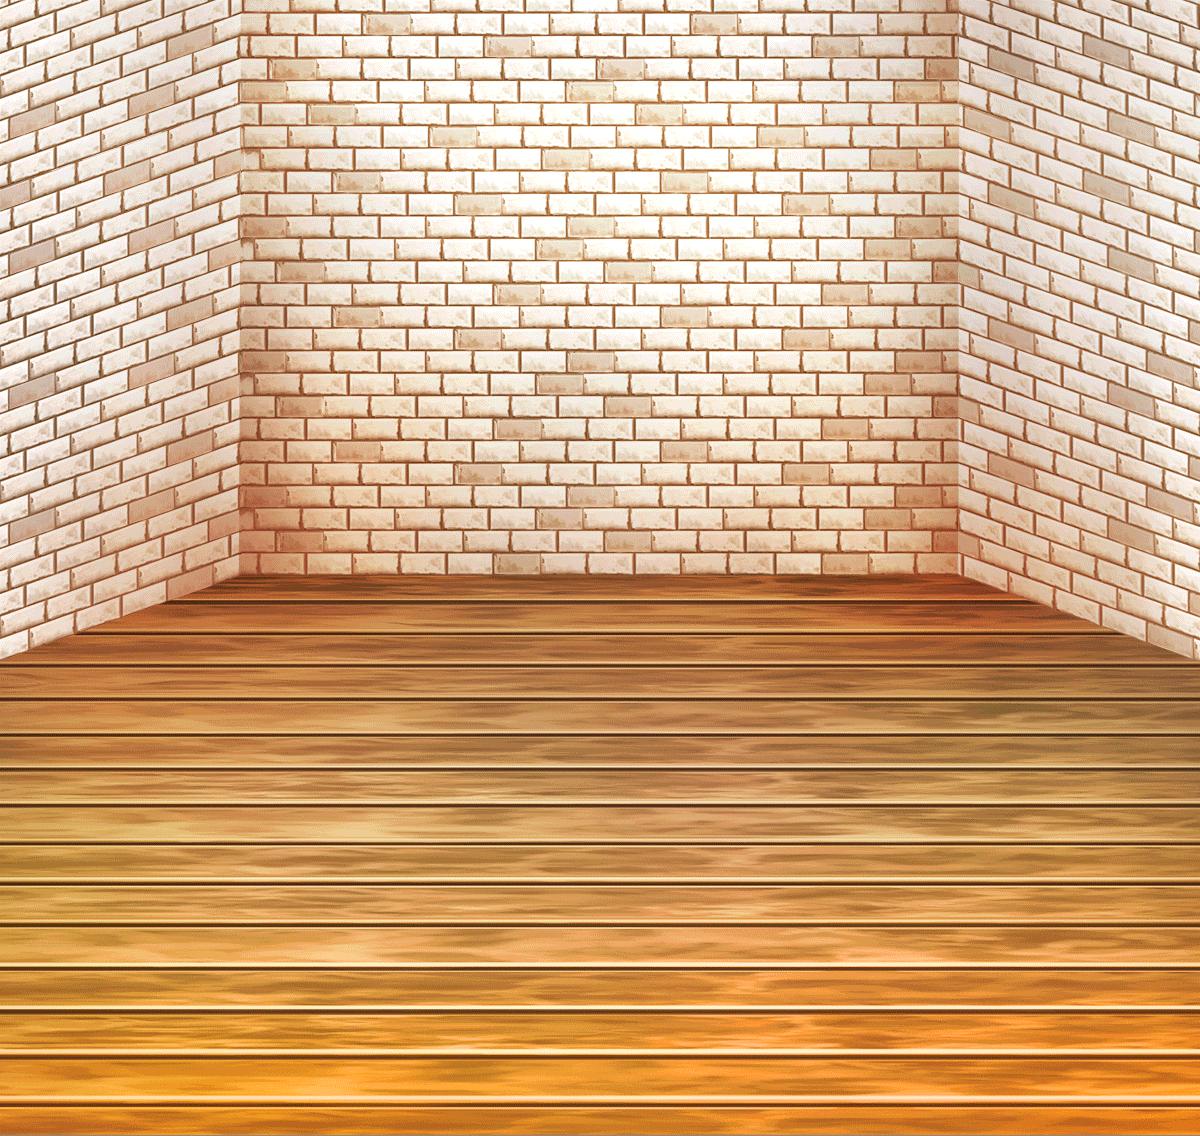 Image Furniture Classic Wallpaper Background Png Unison League